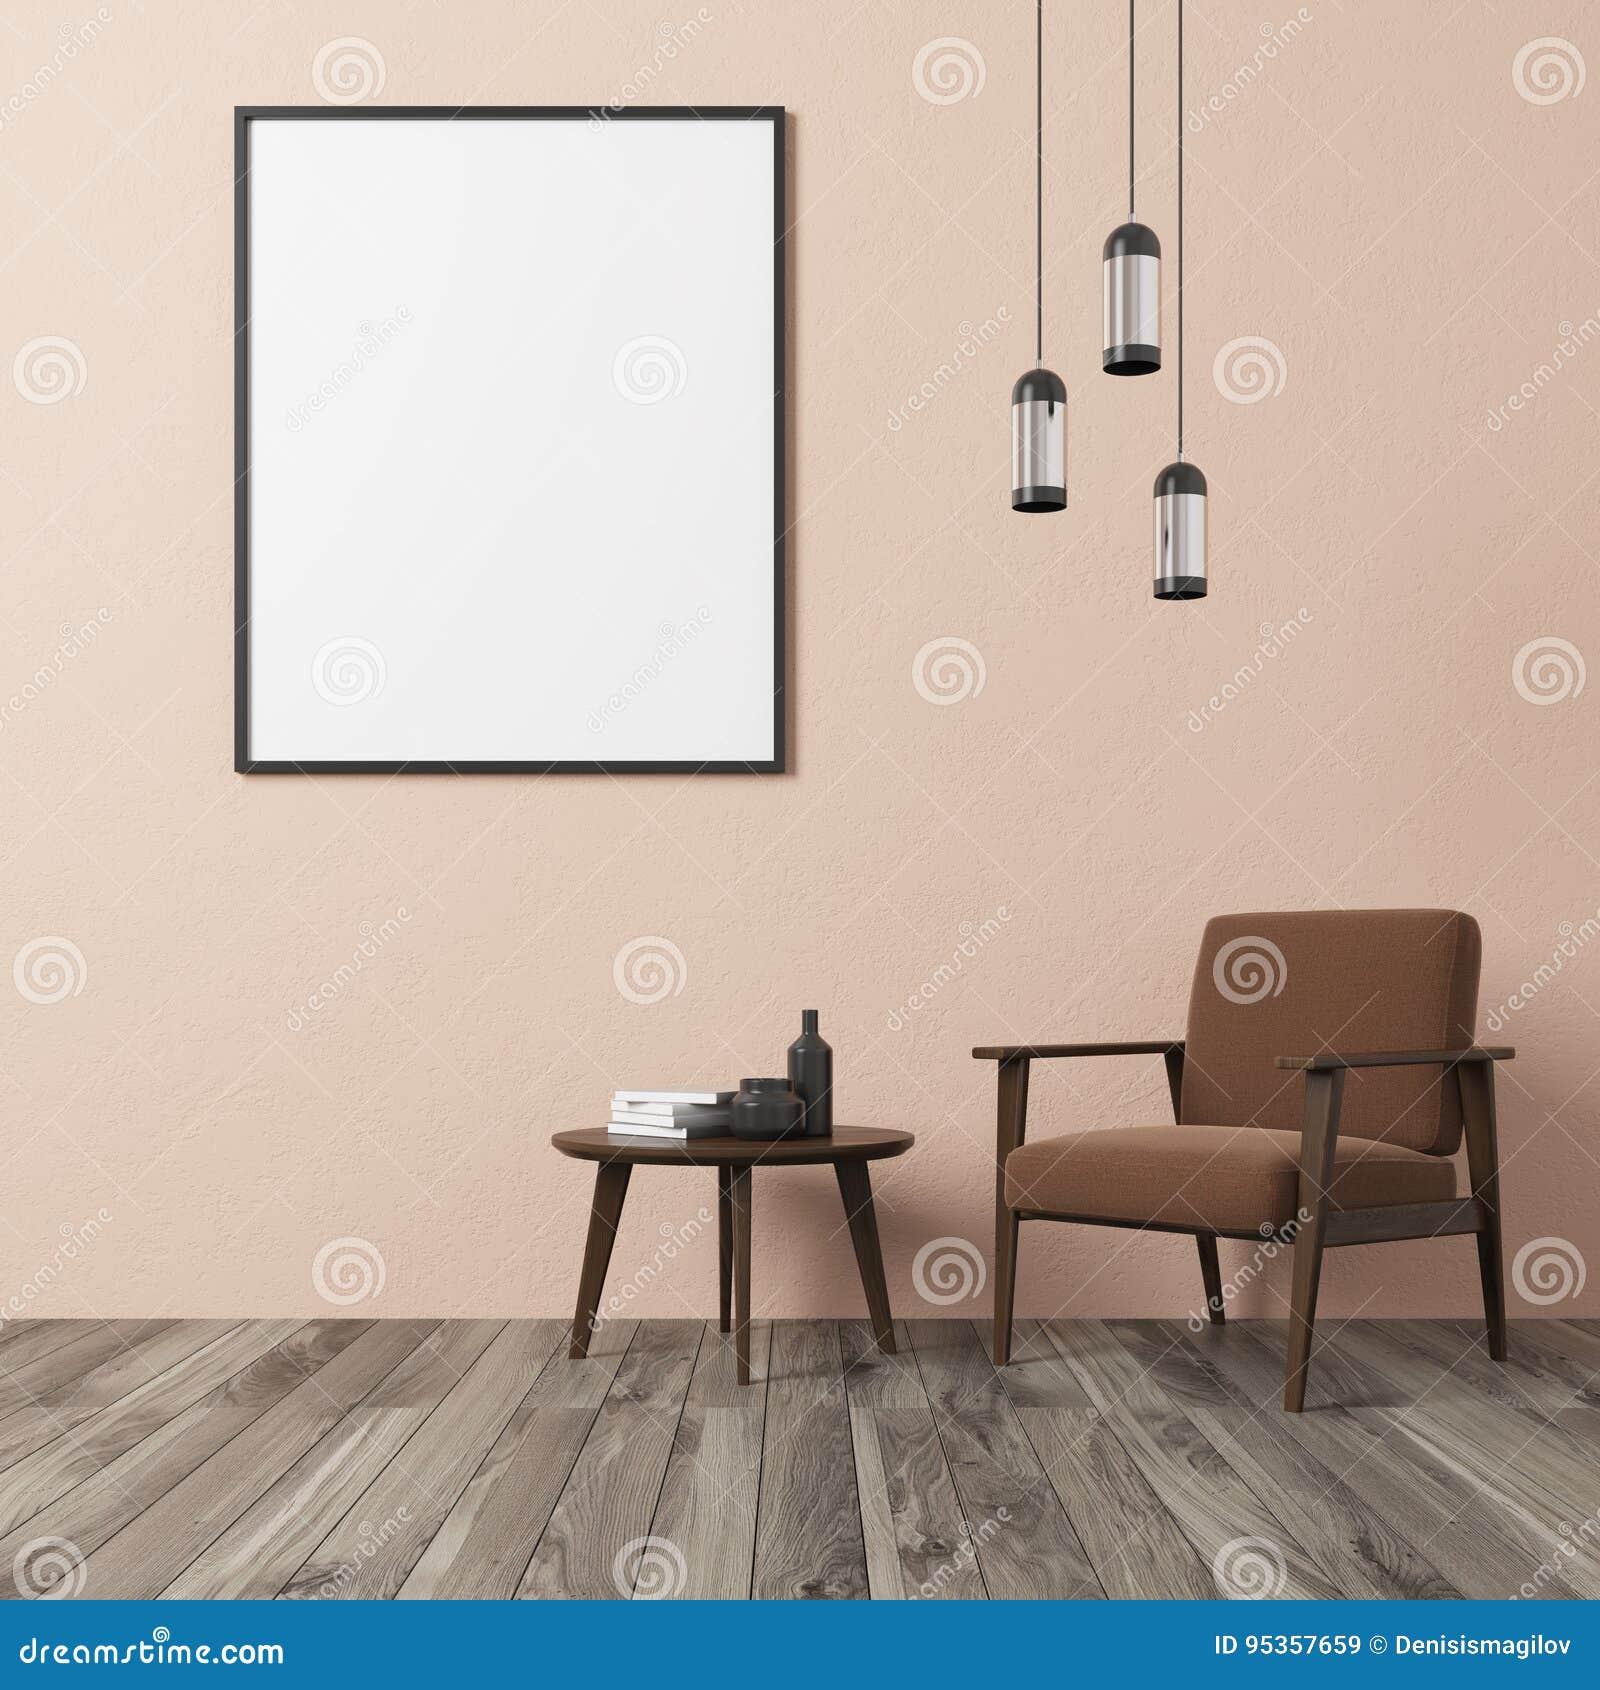 Salon Beige De Mur, Fauteuil Brun Illustration Stock - Illustration ...